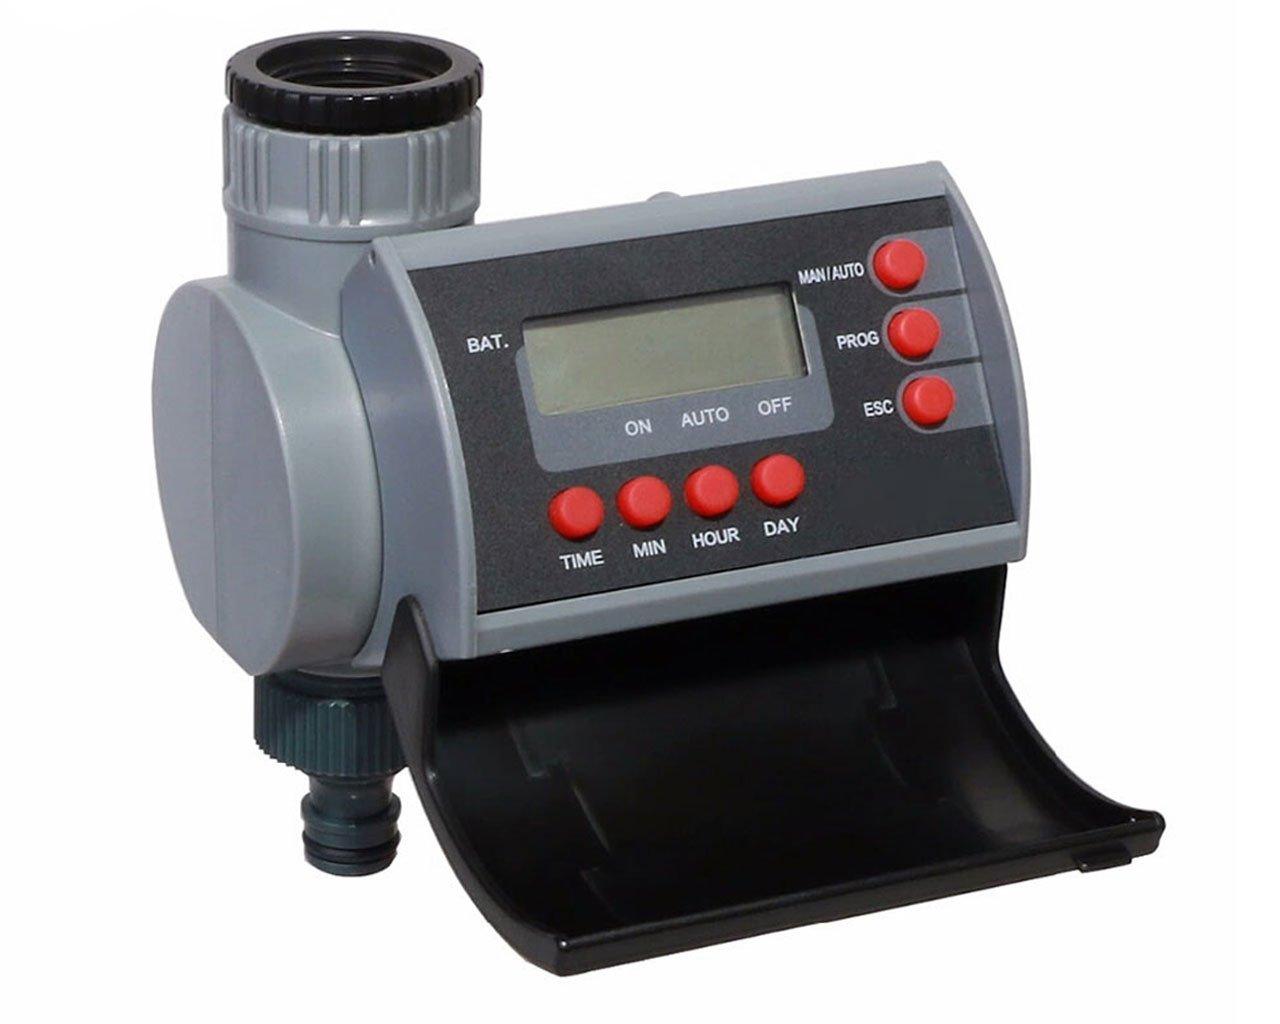 Digital Electronic Hose Water Solenoid Valve Timer Garden Irrigation Controller